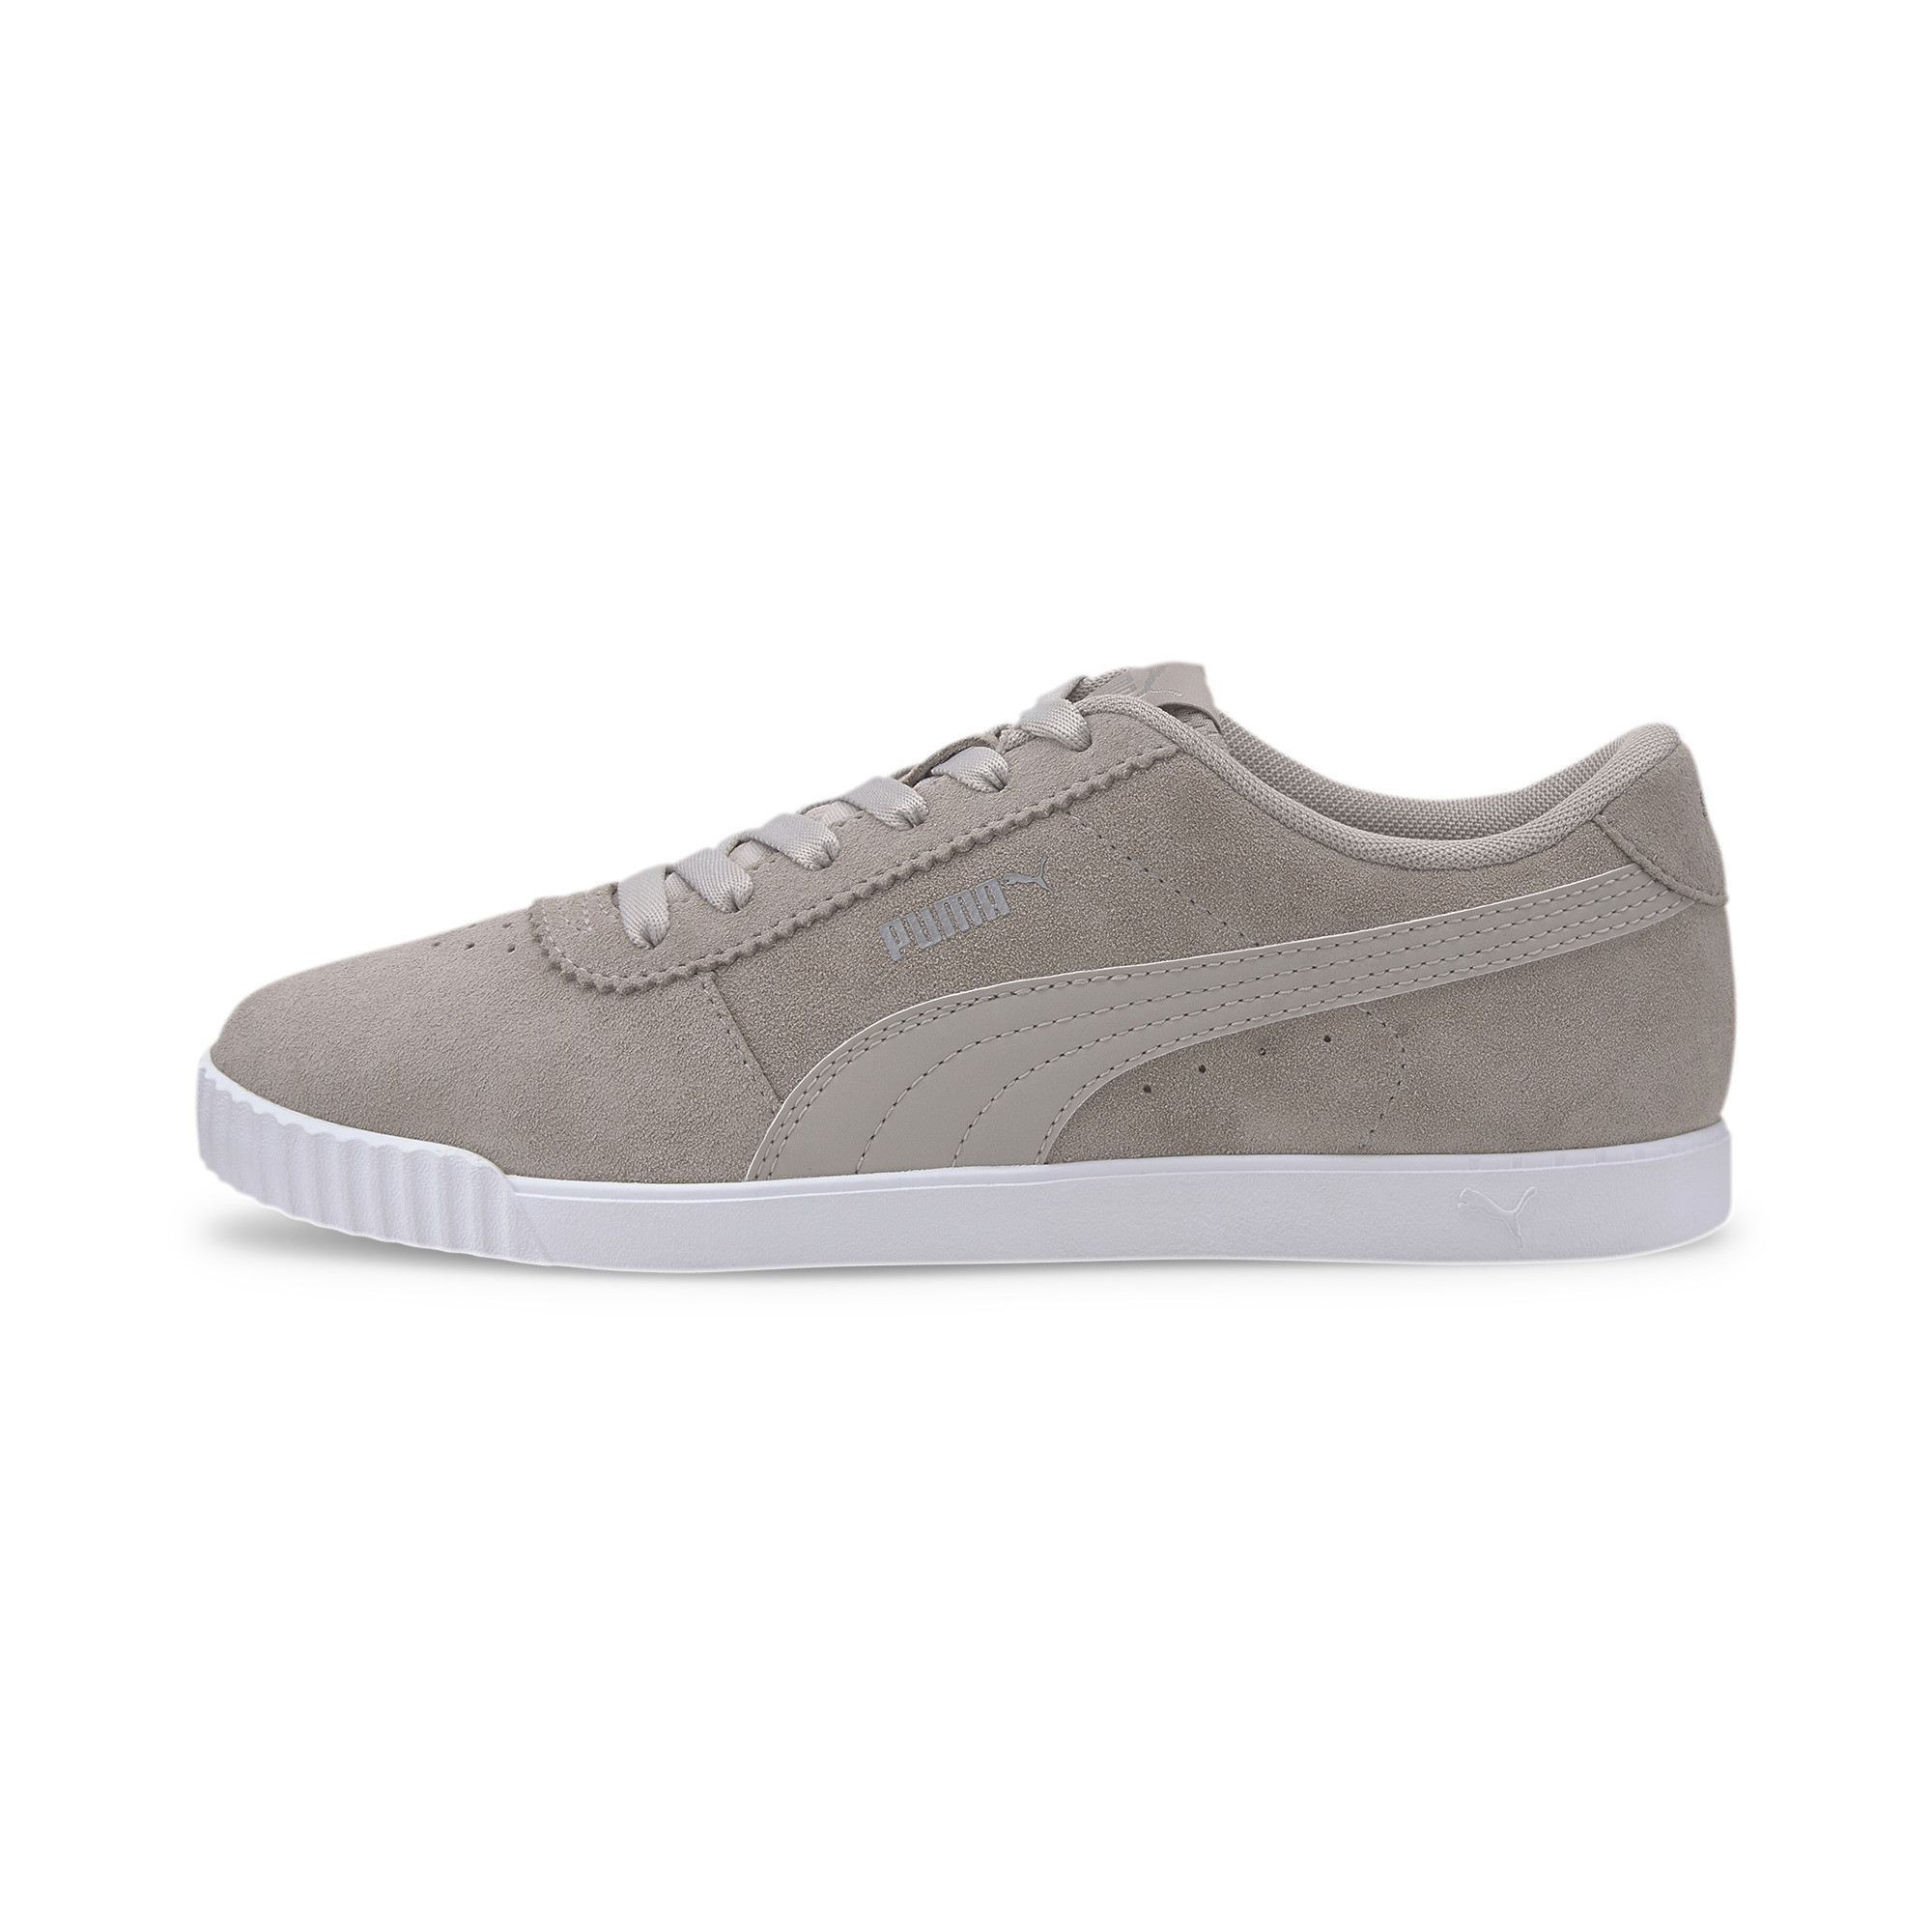 PUMA-Women-039-s-Carina-Slim-Suede-Sneakers thumbnail 4